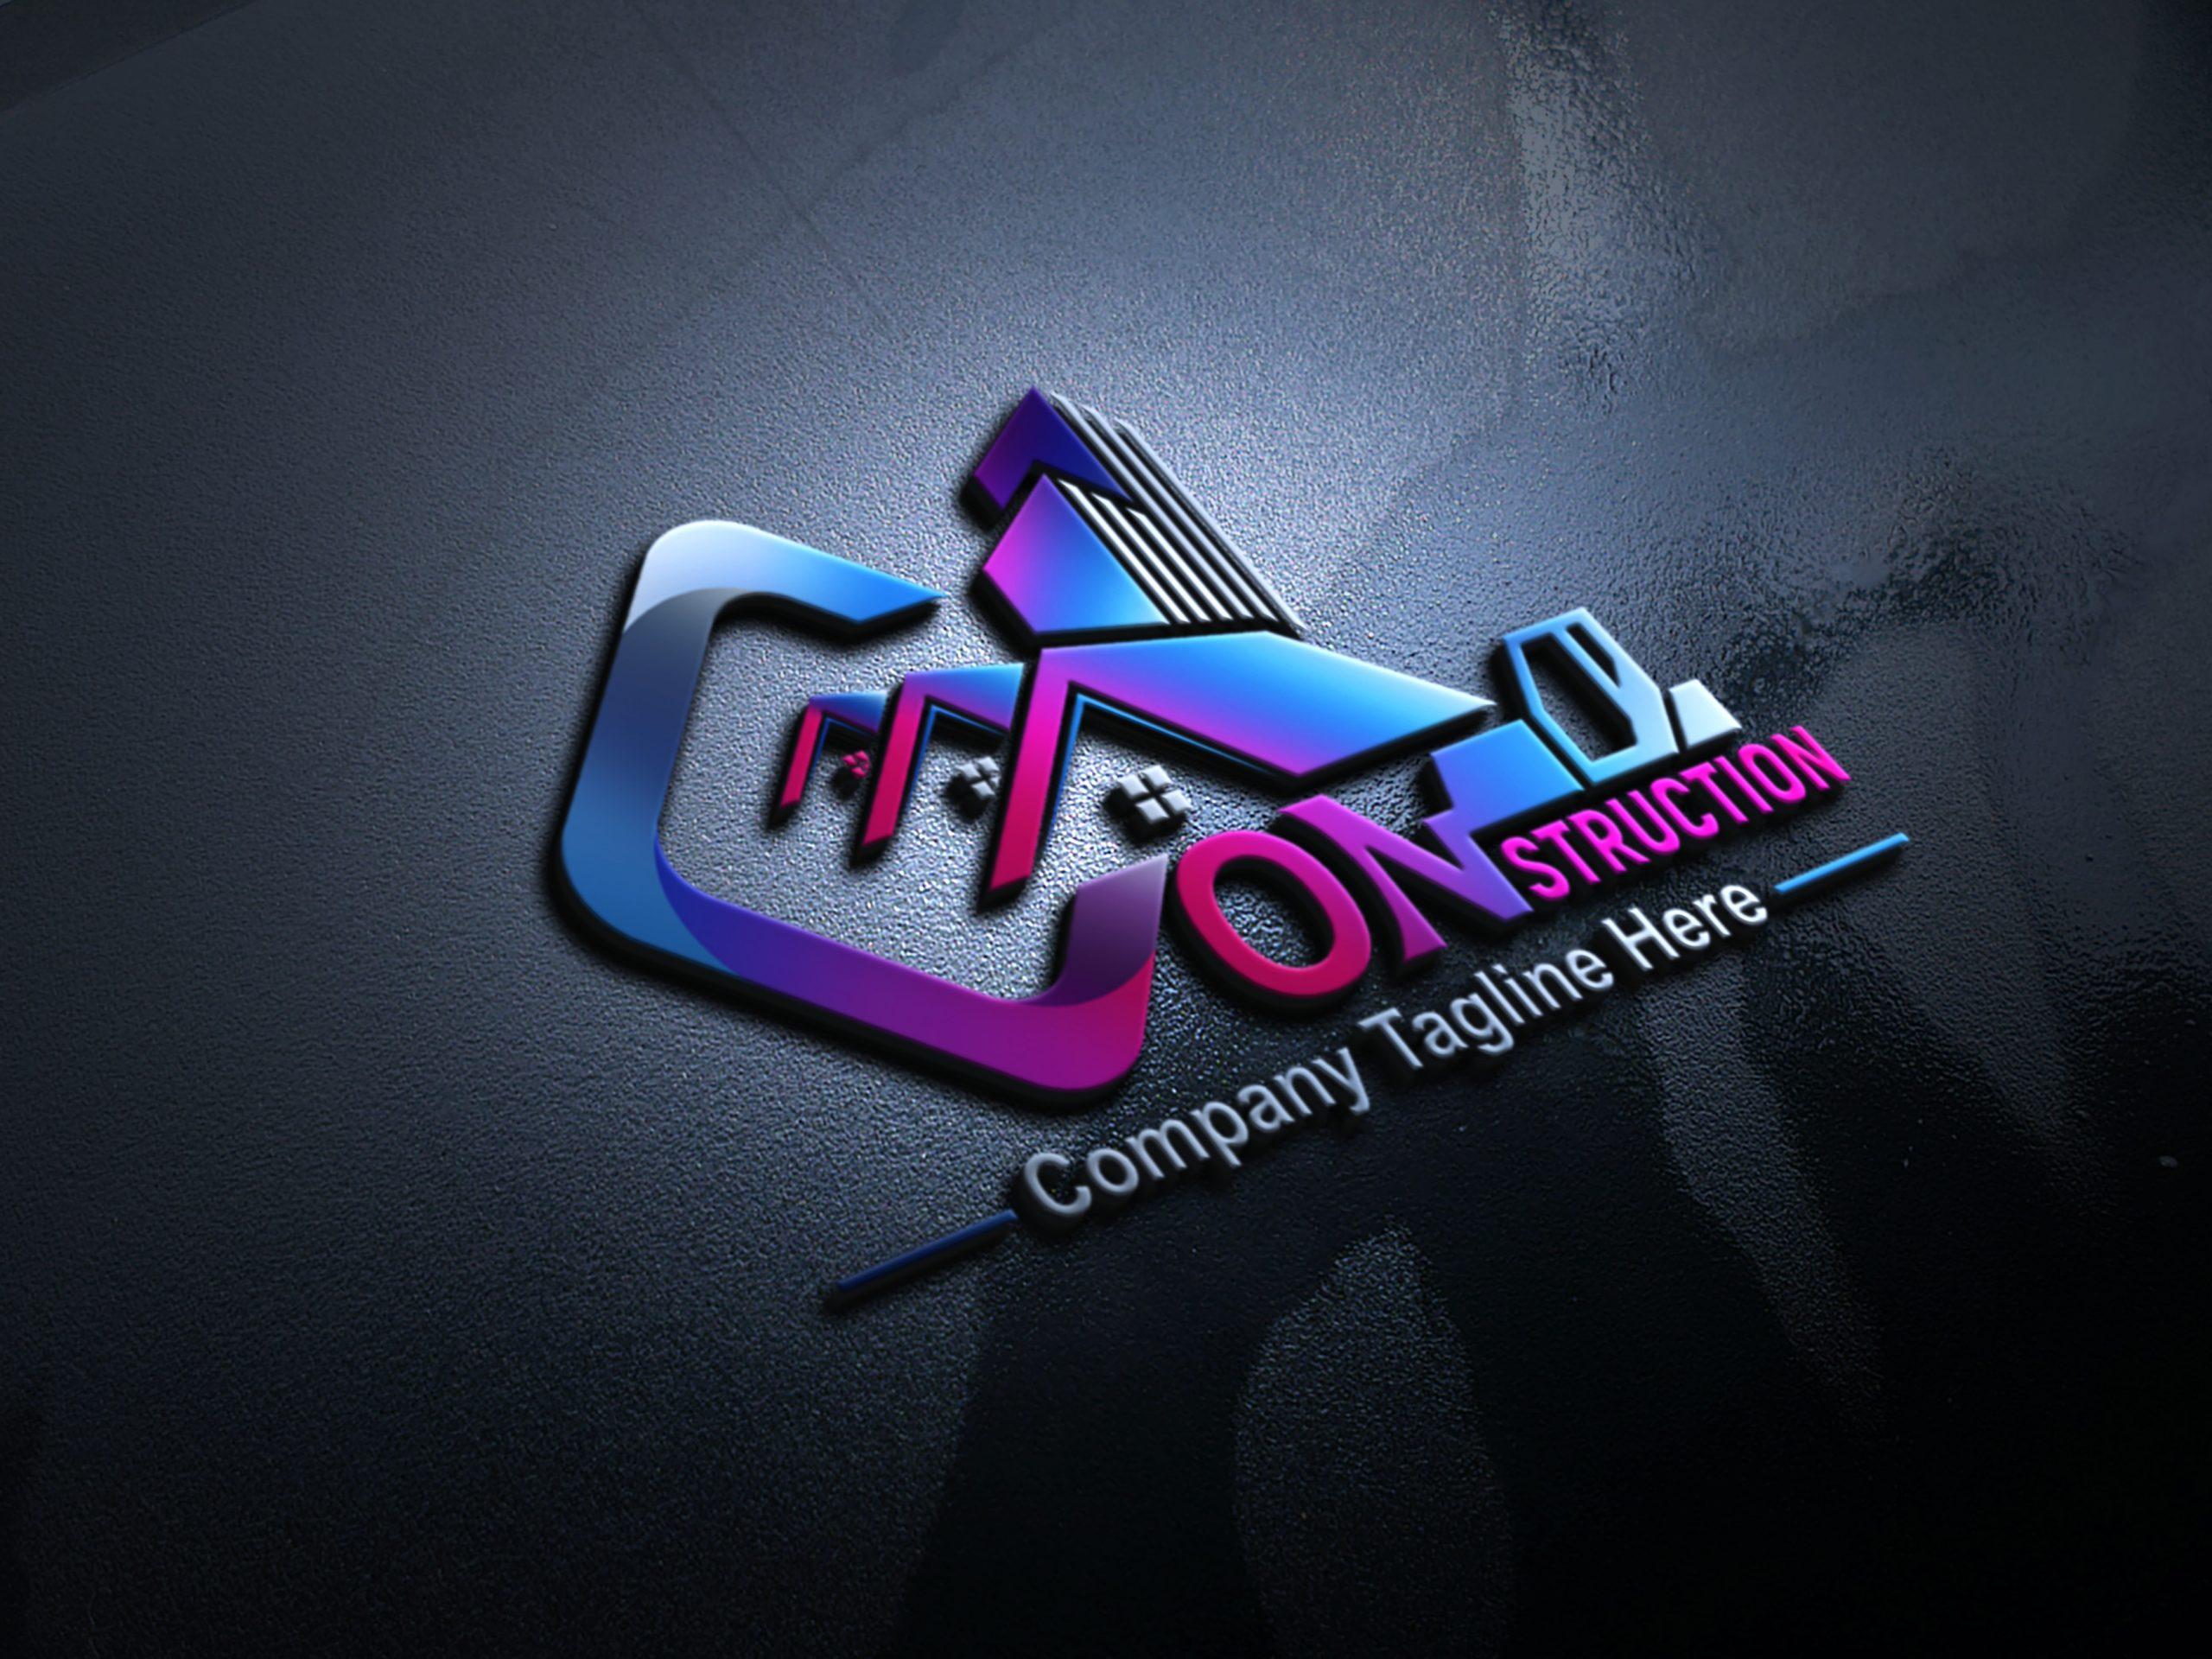 Construction Company, Contractor, Handyman Logo Design PSD Source